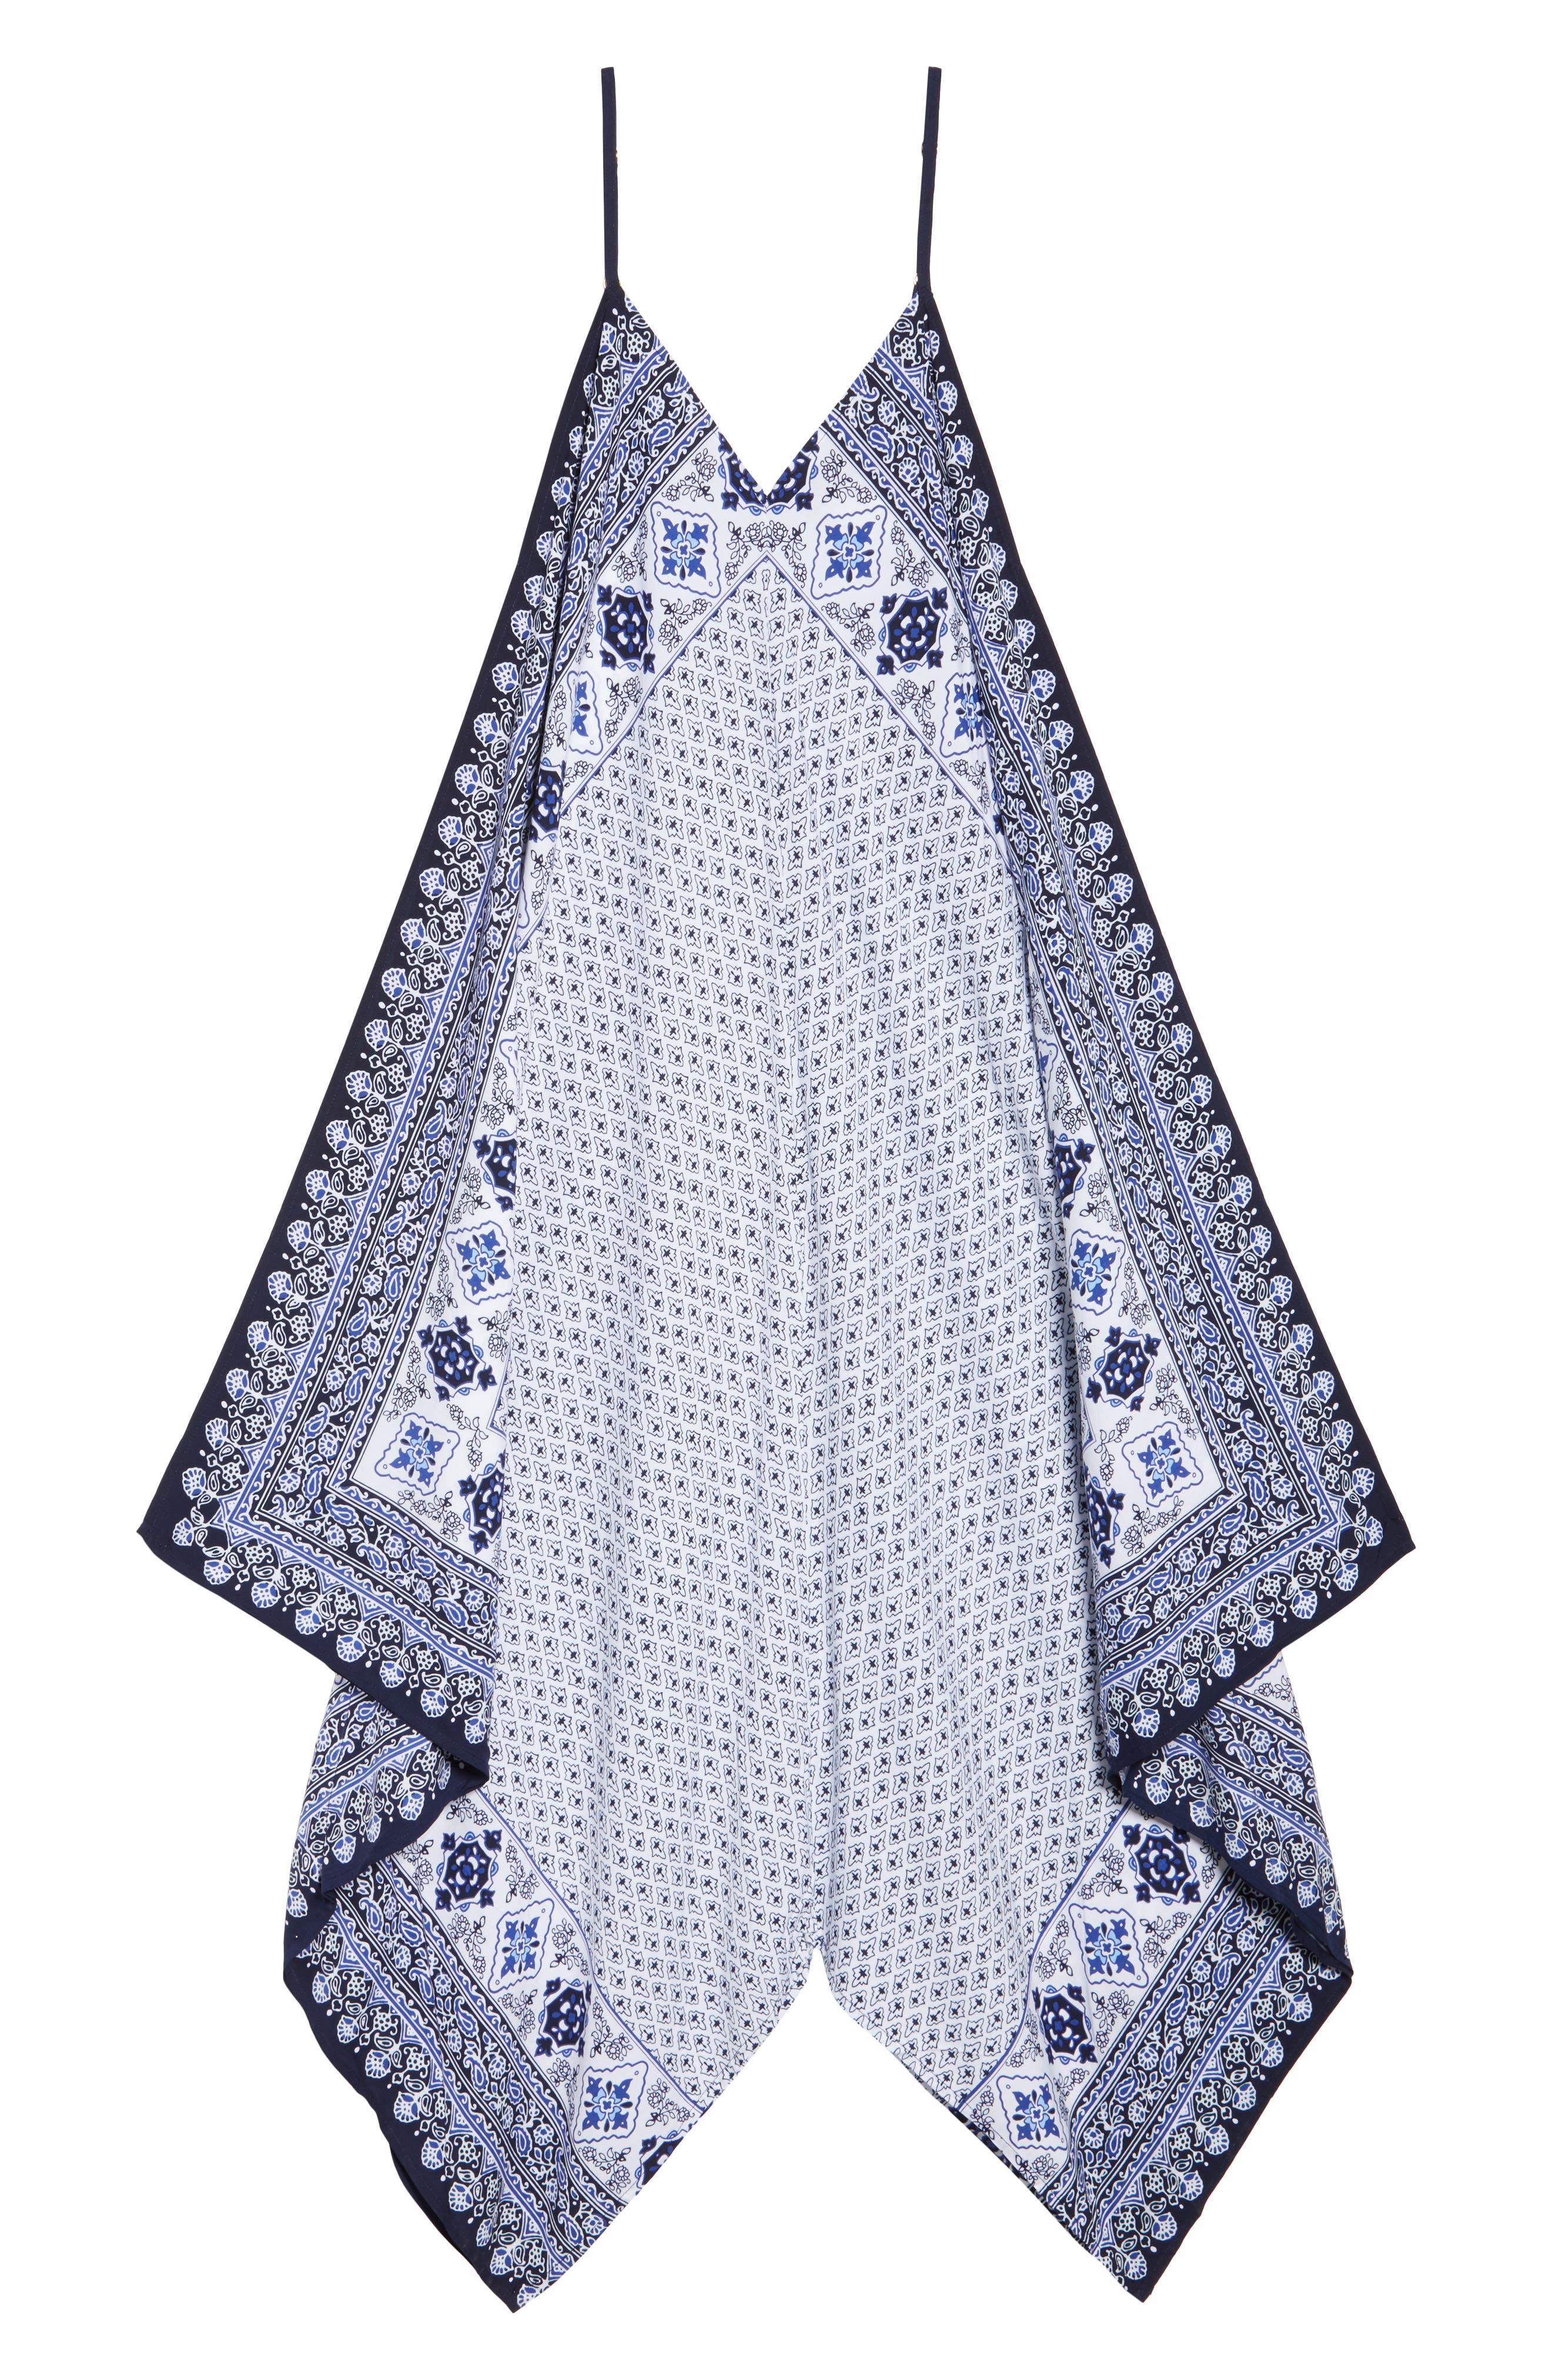 Border Print Cover-Up Maxi Dress,                             Alternate thumbnail 6, color,                             400